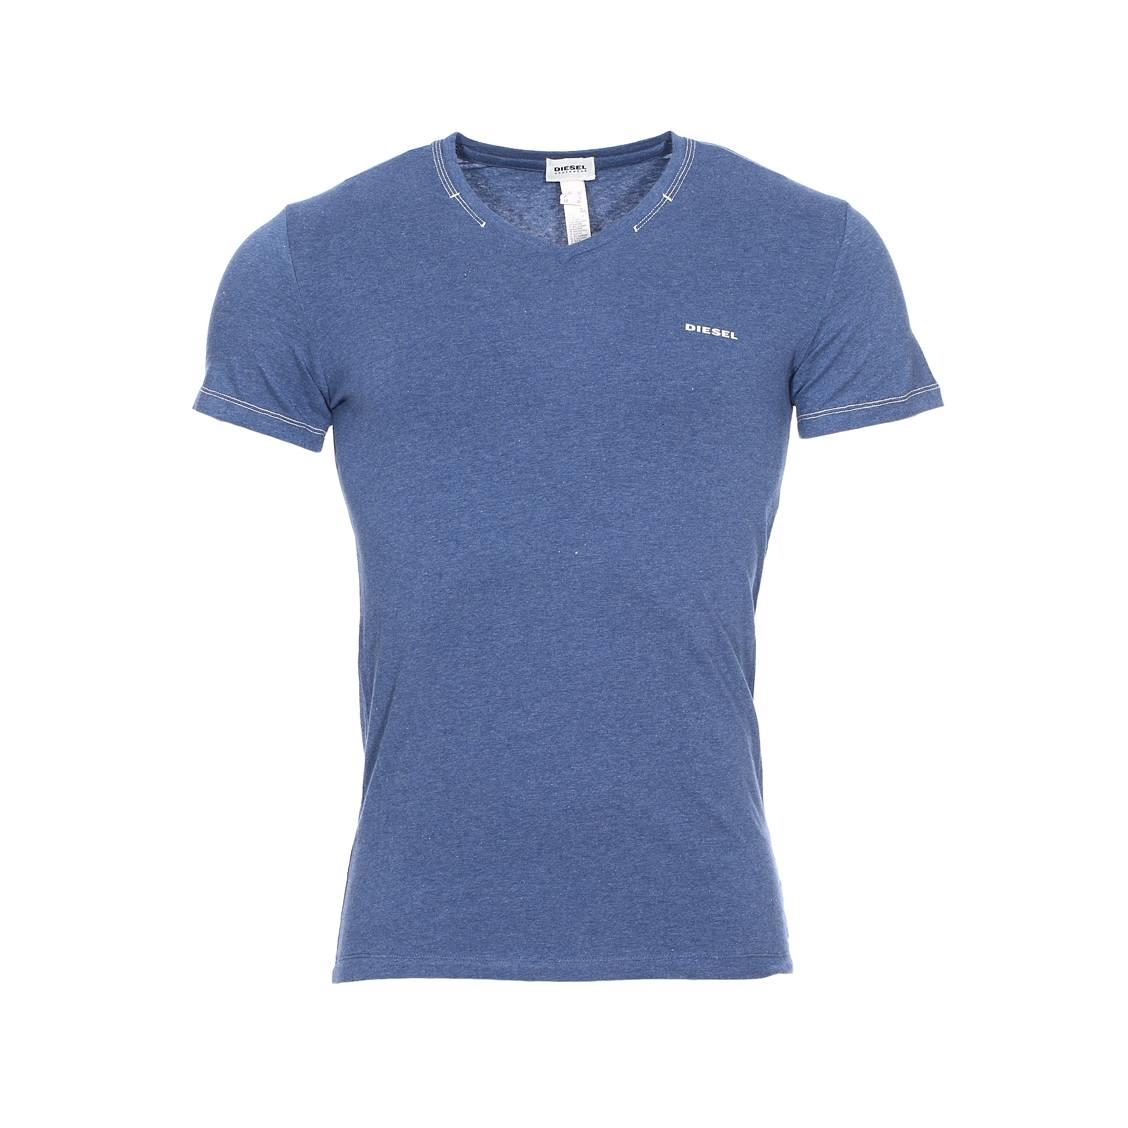 Tee-shirt col v  en coton stretch bleu jean